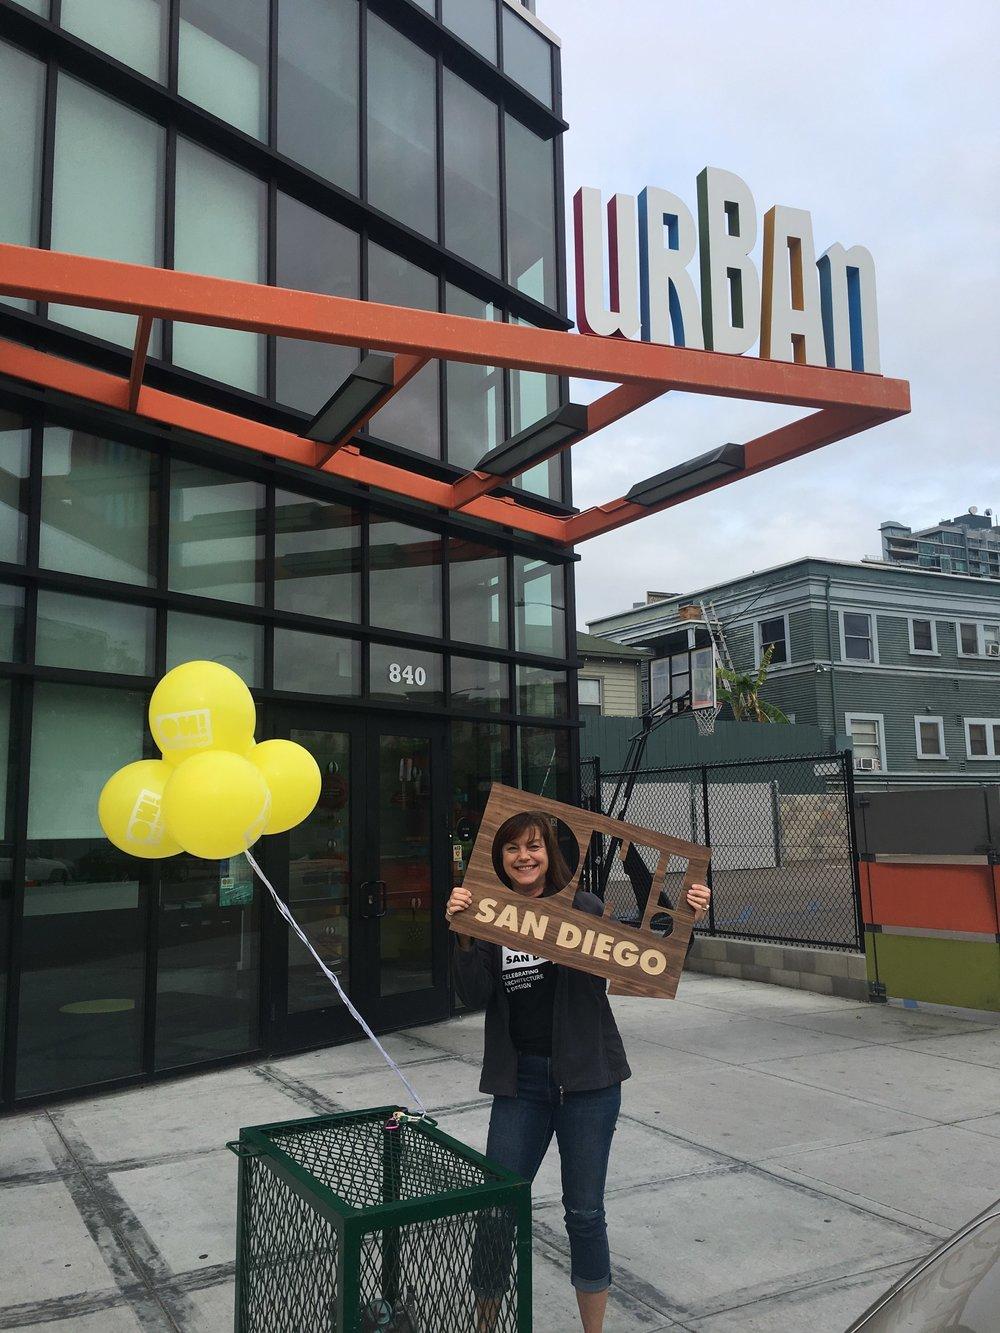 Karen balloons.jpg